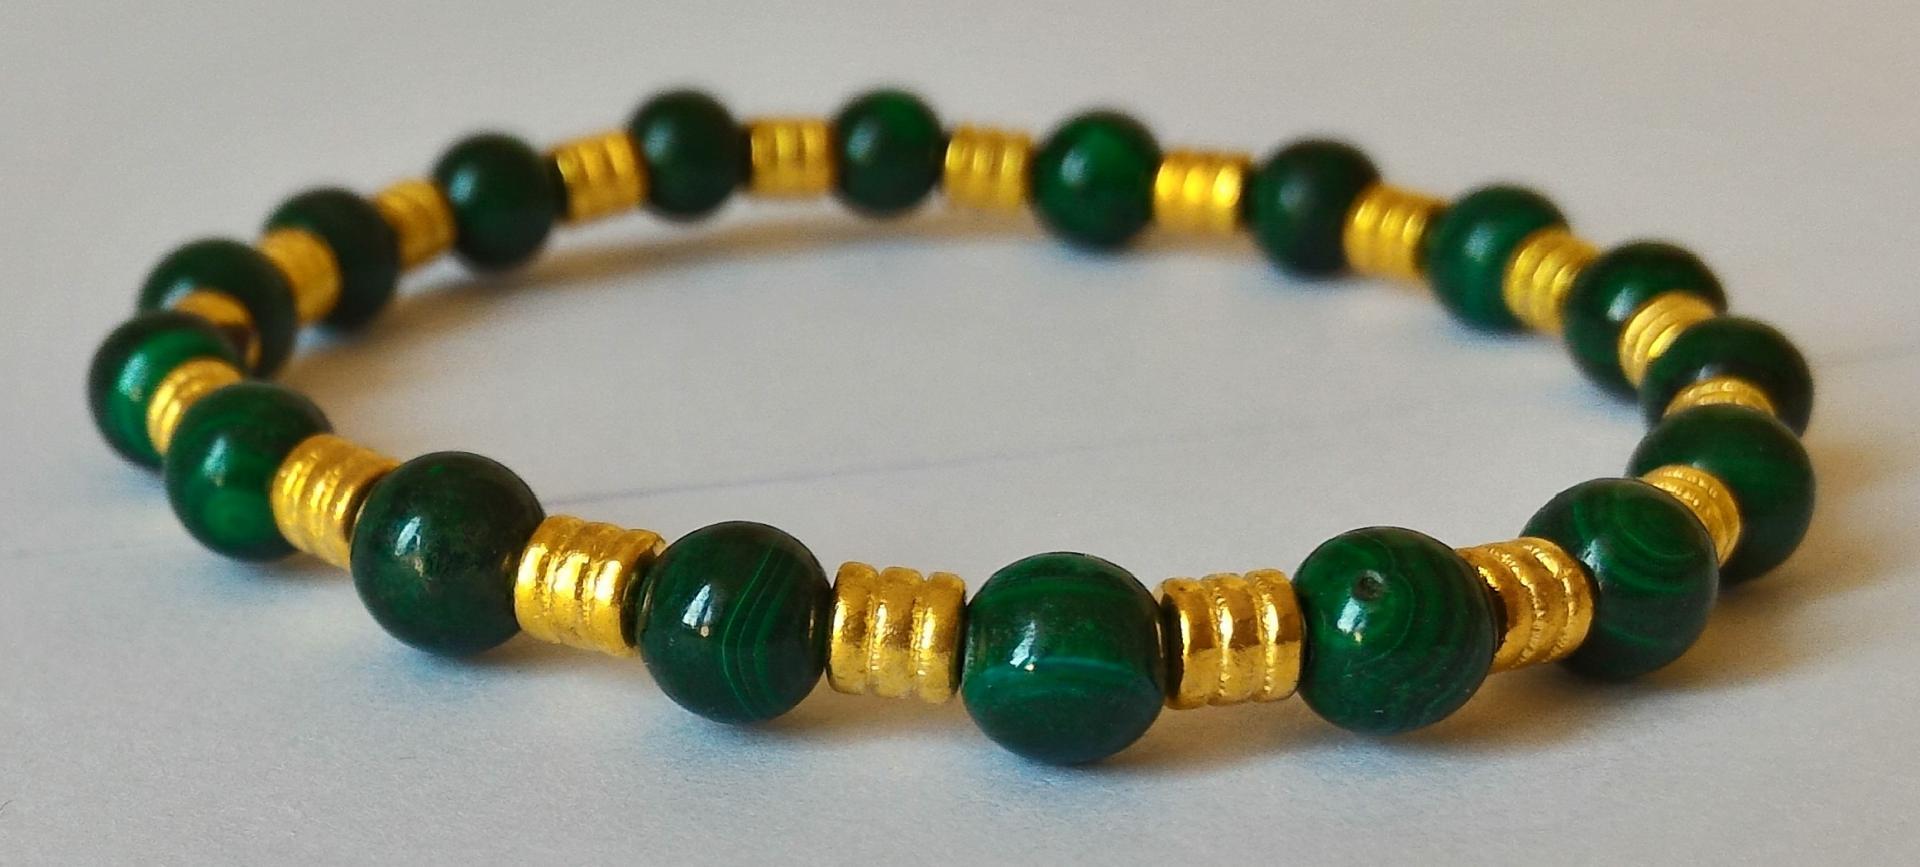 Bracelet malachite 4